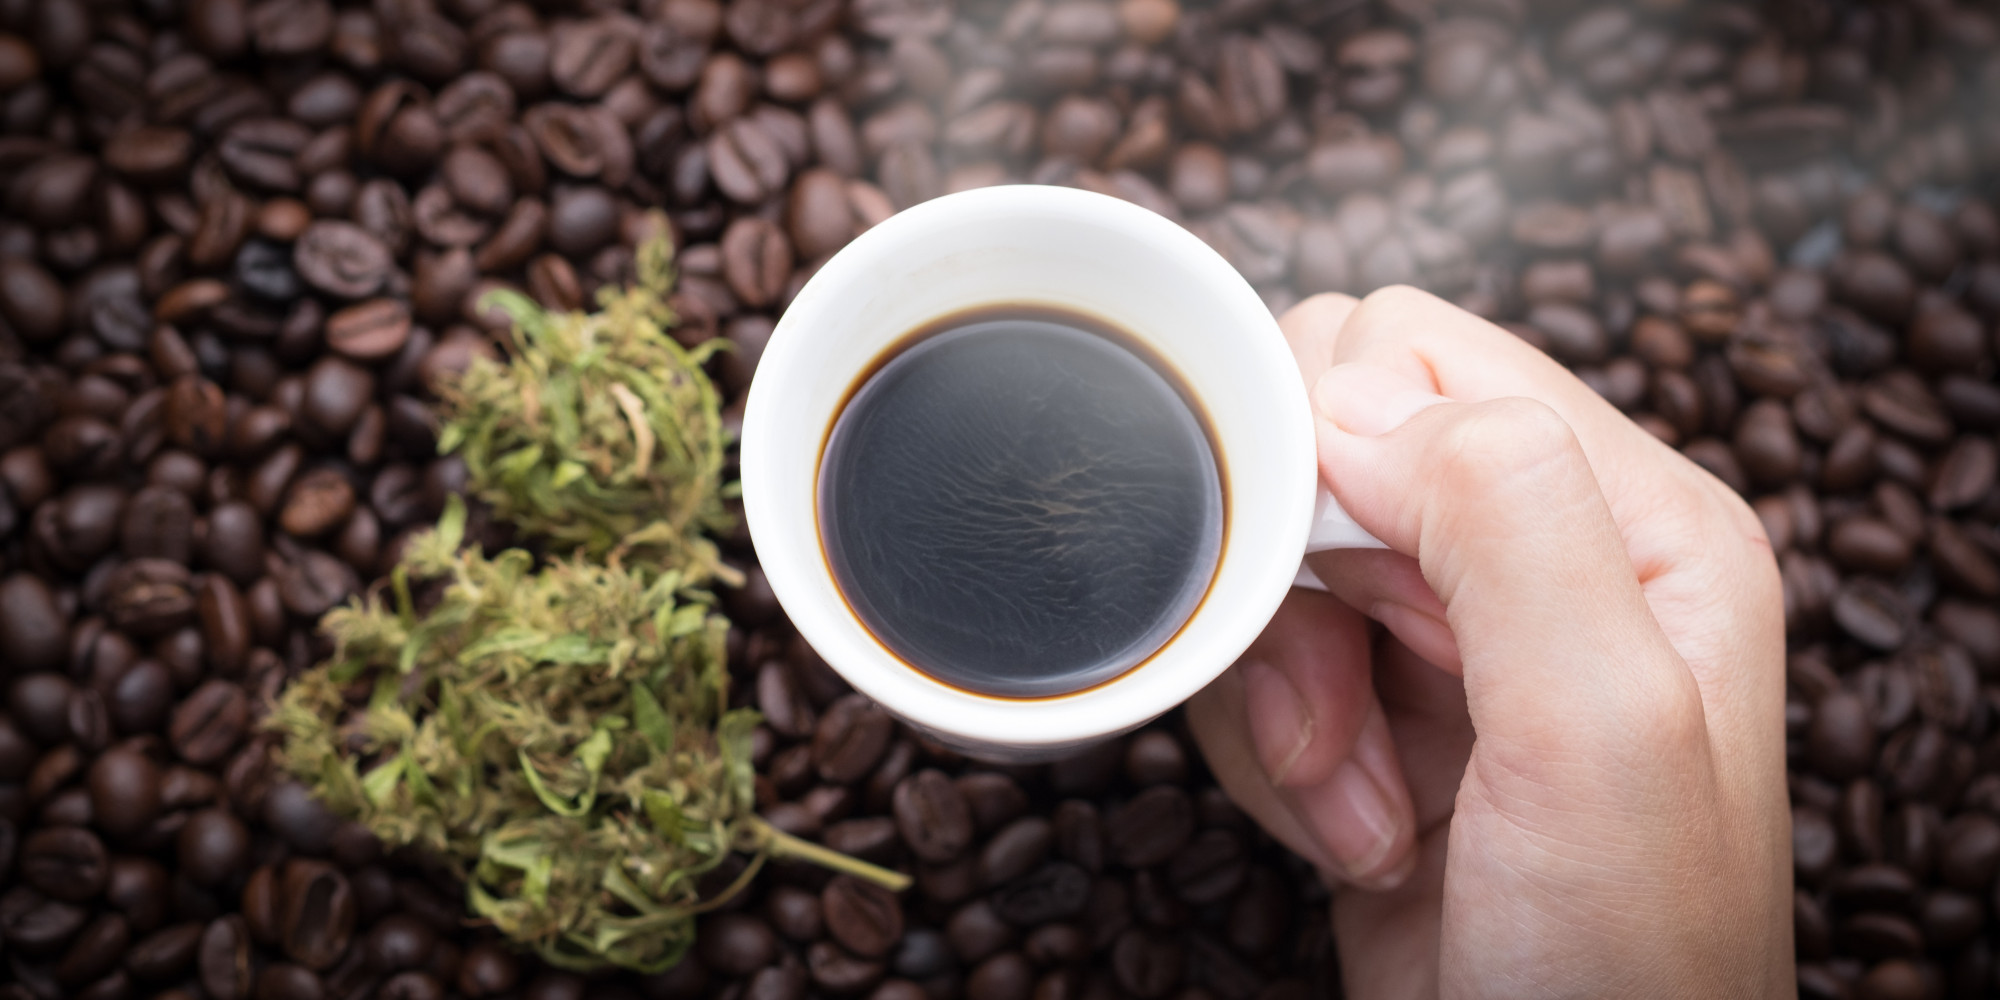 Cannabis coffee in hand